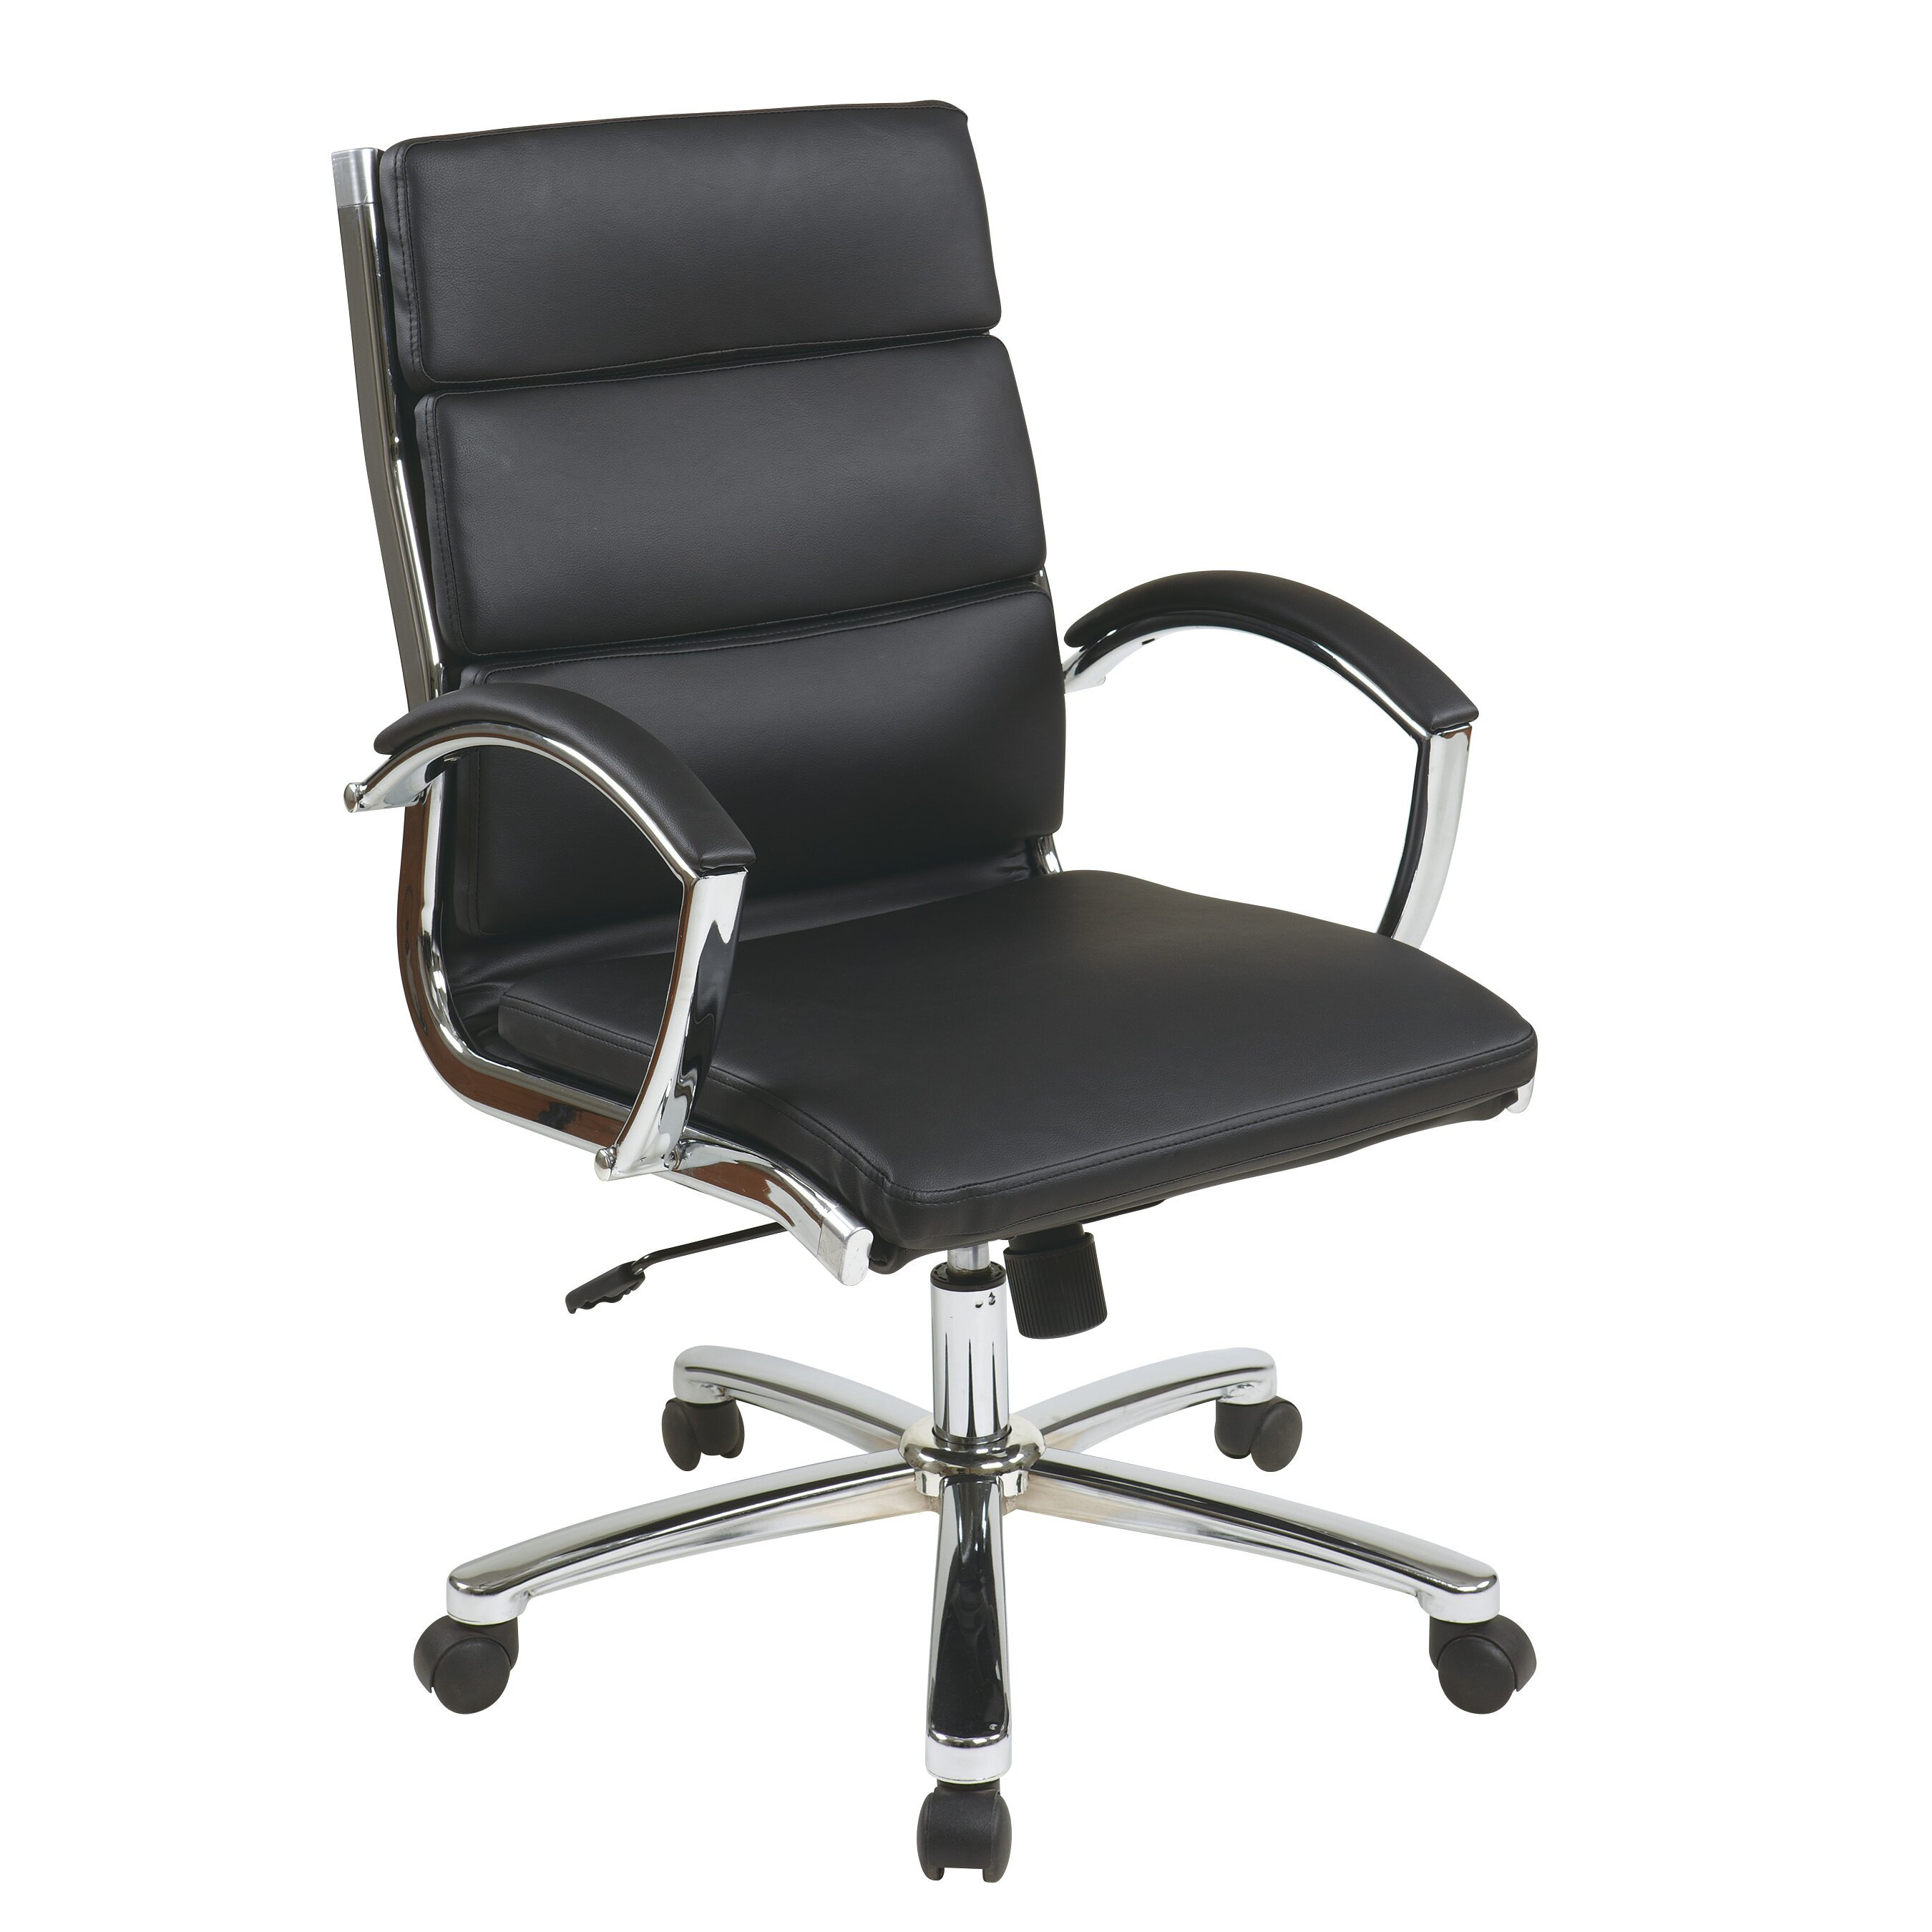 brayden studio dunarragan mid back executive chair bedroomalluring members mark leather executive chair